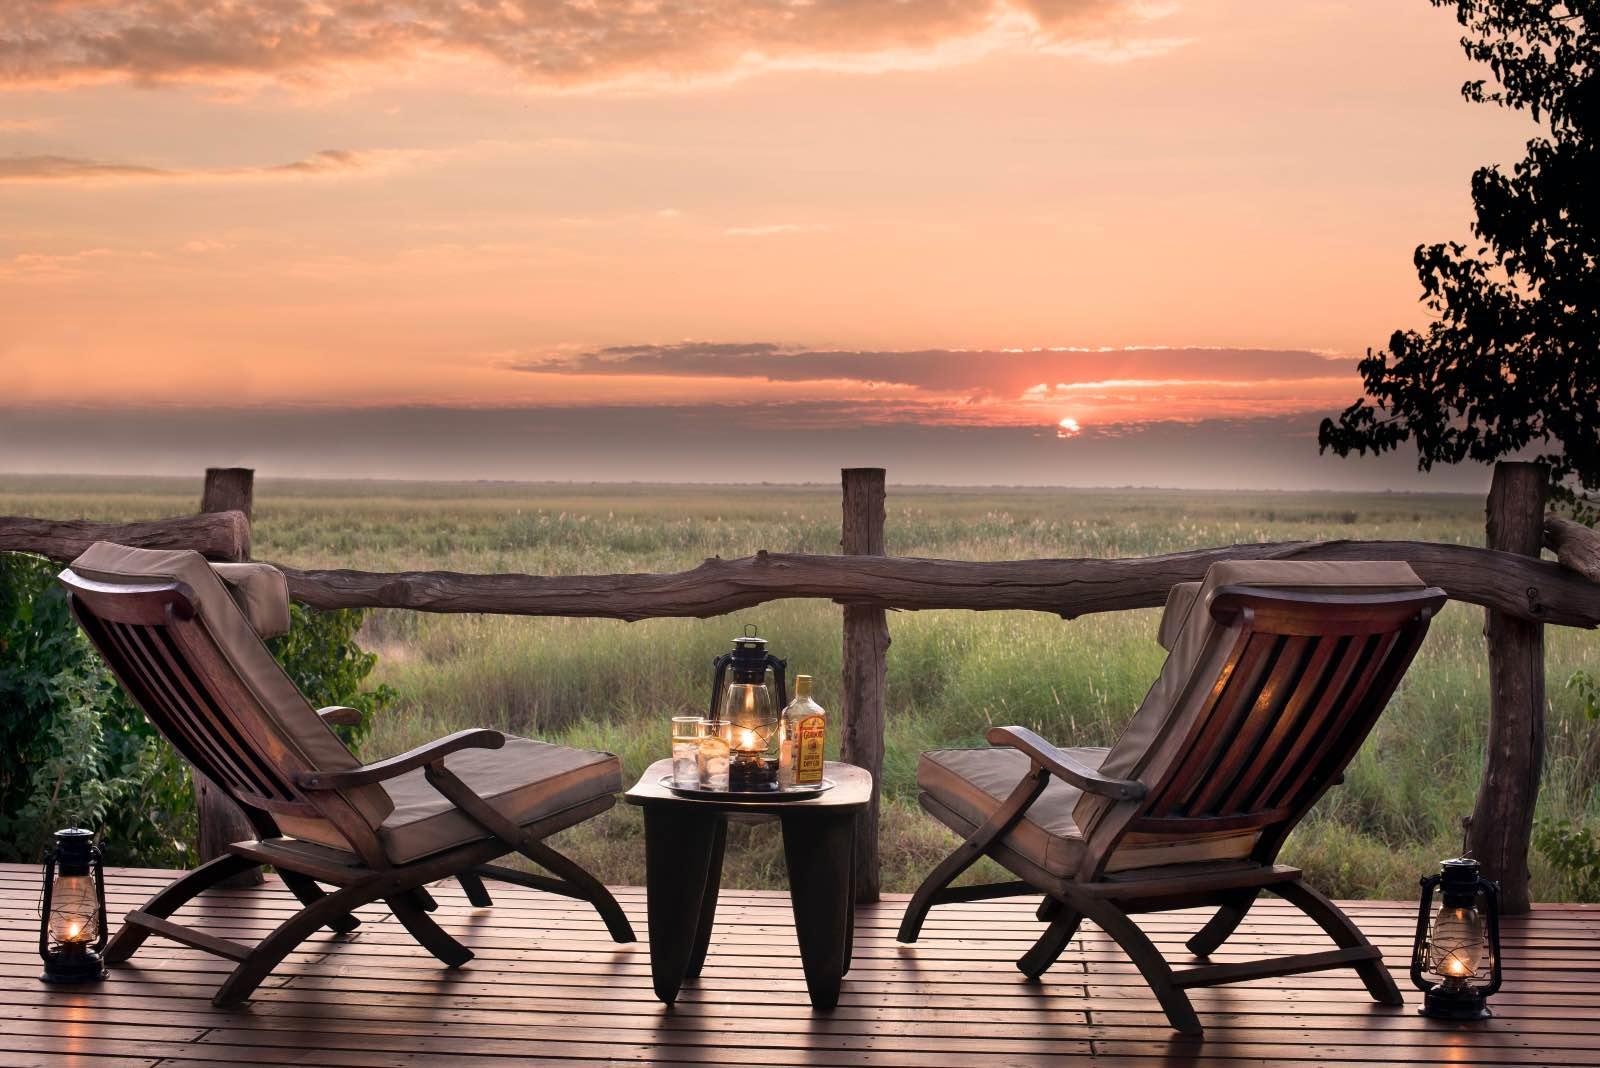 Explore the best bits of Botswana in 10 days